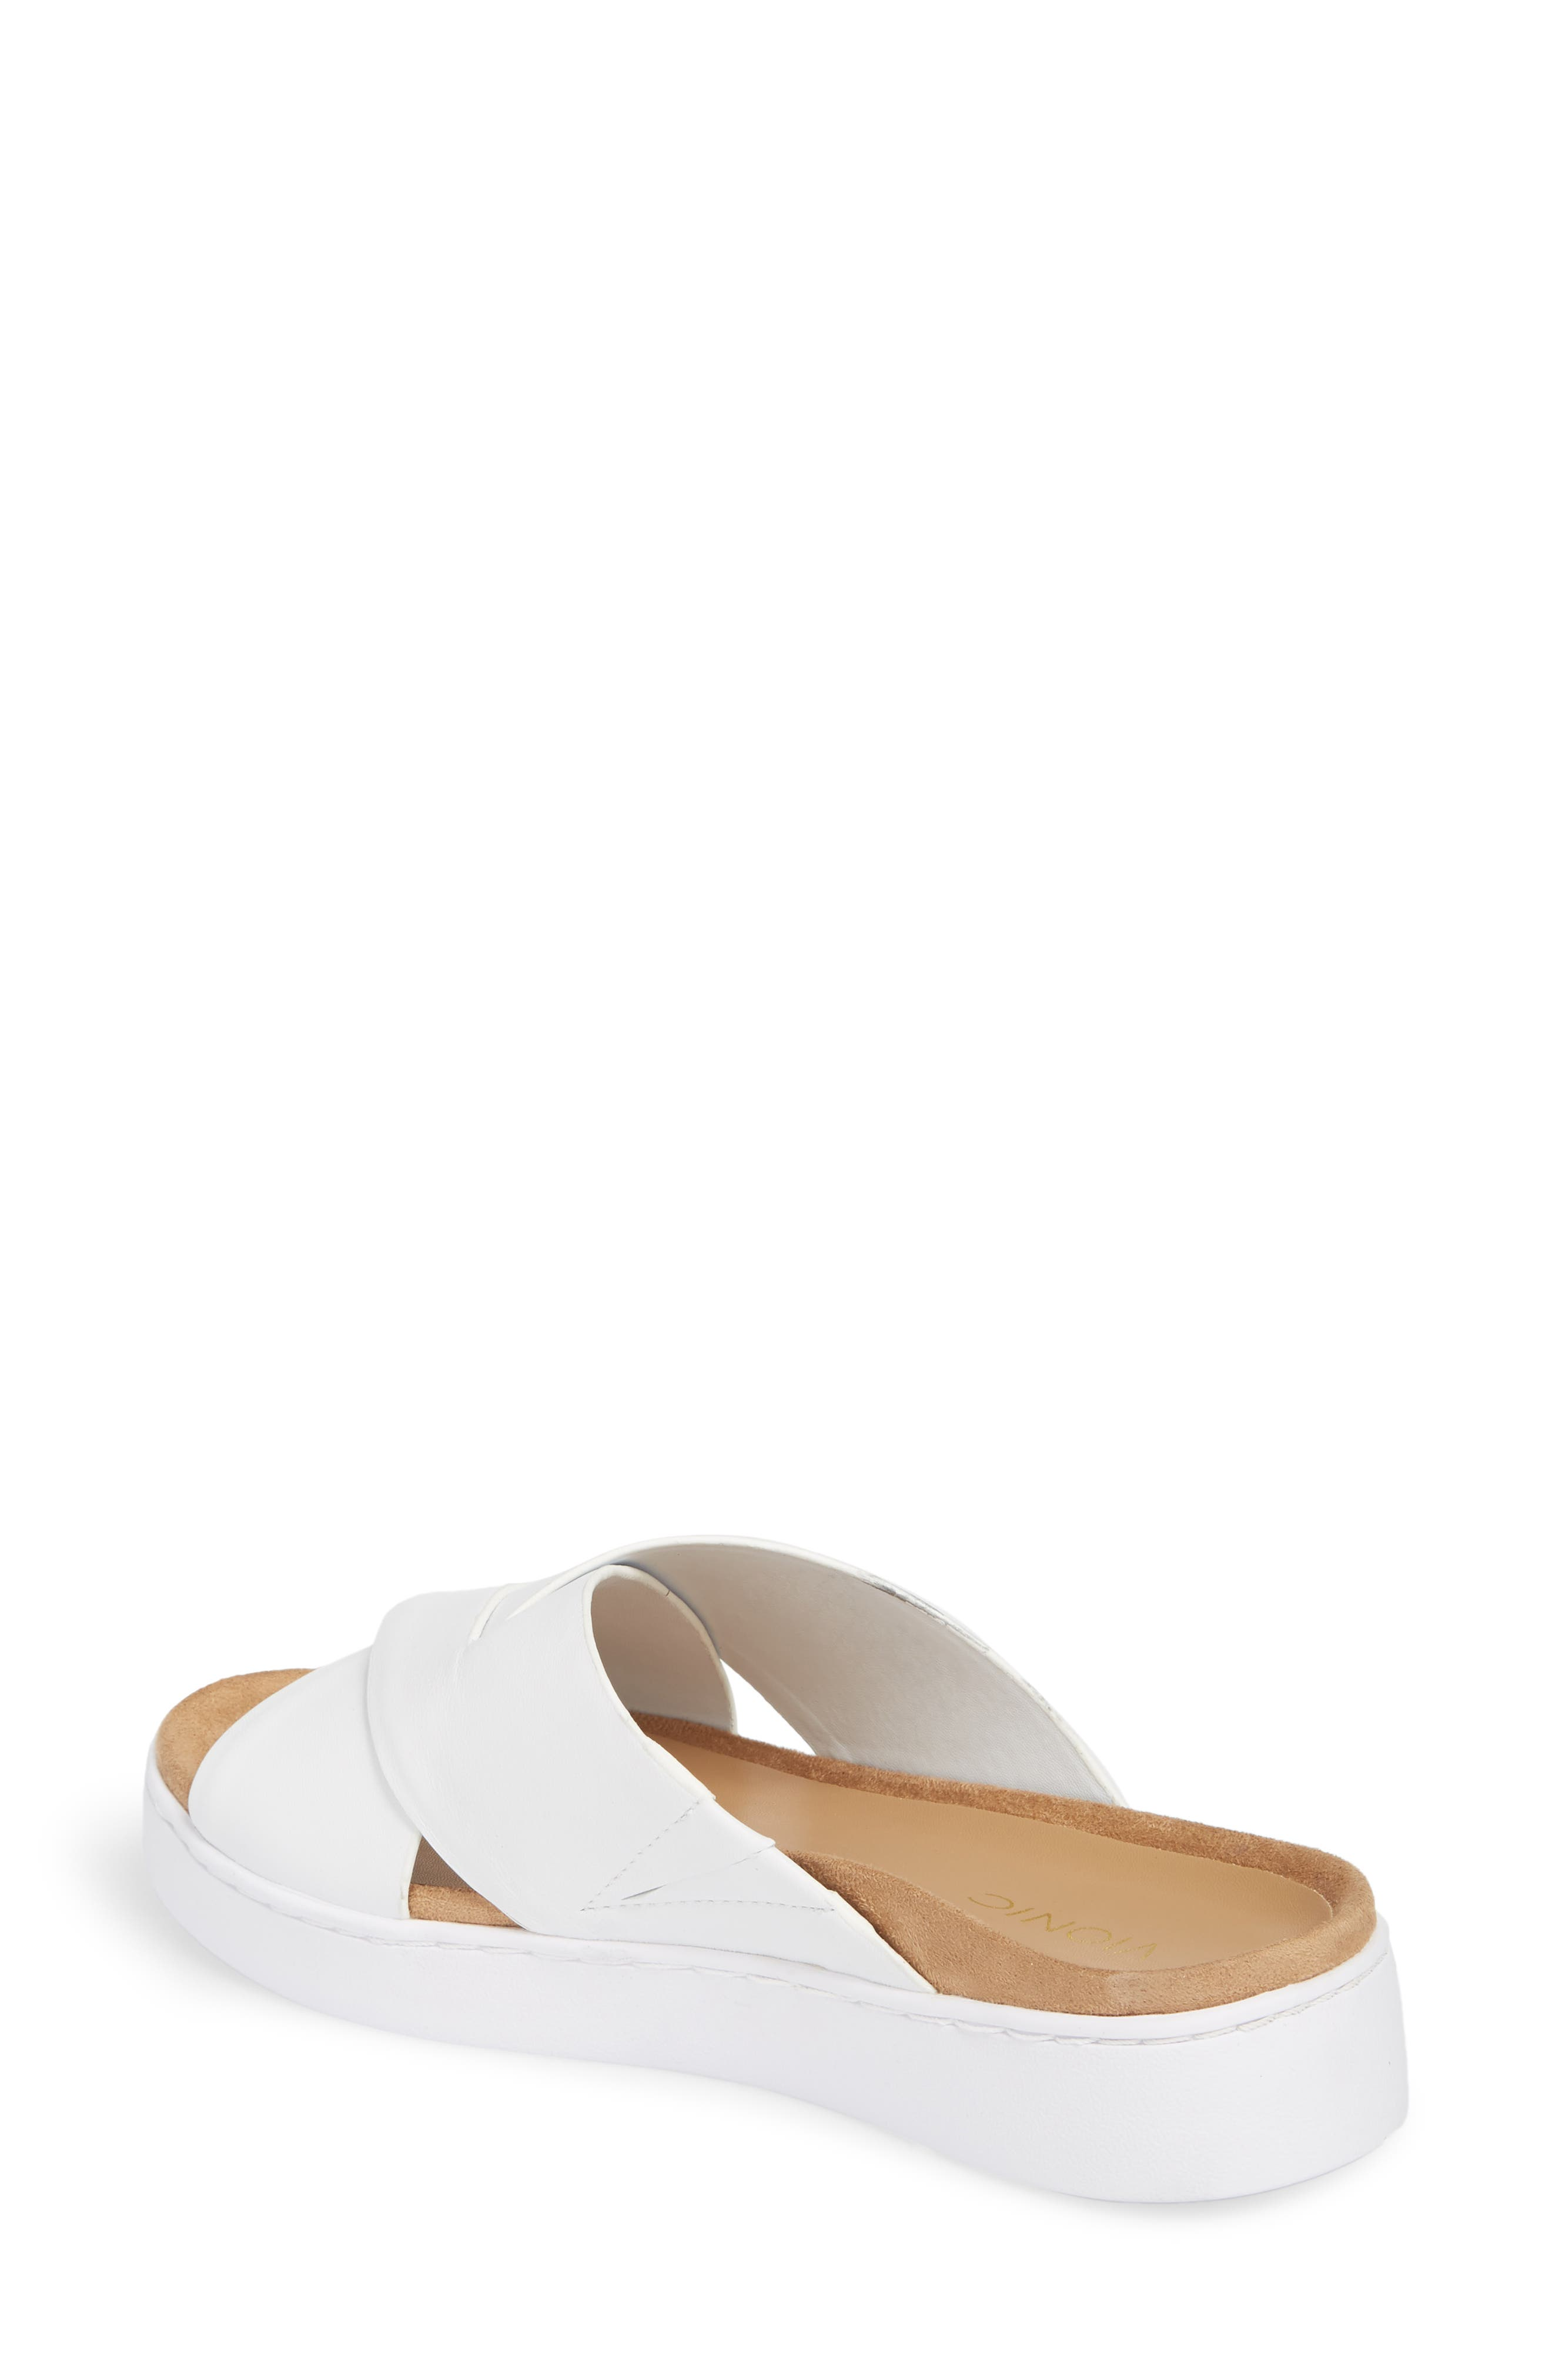 Lou Slide Sandal,                             Alternate thumbnail 2, color,                             White Leather